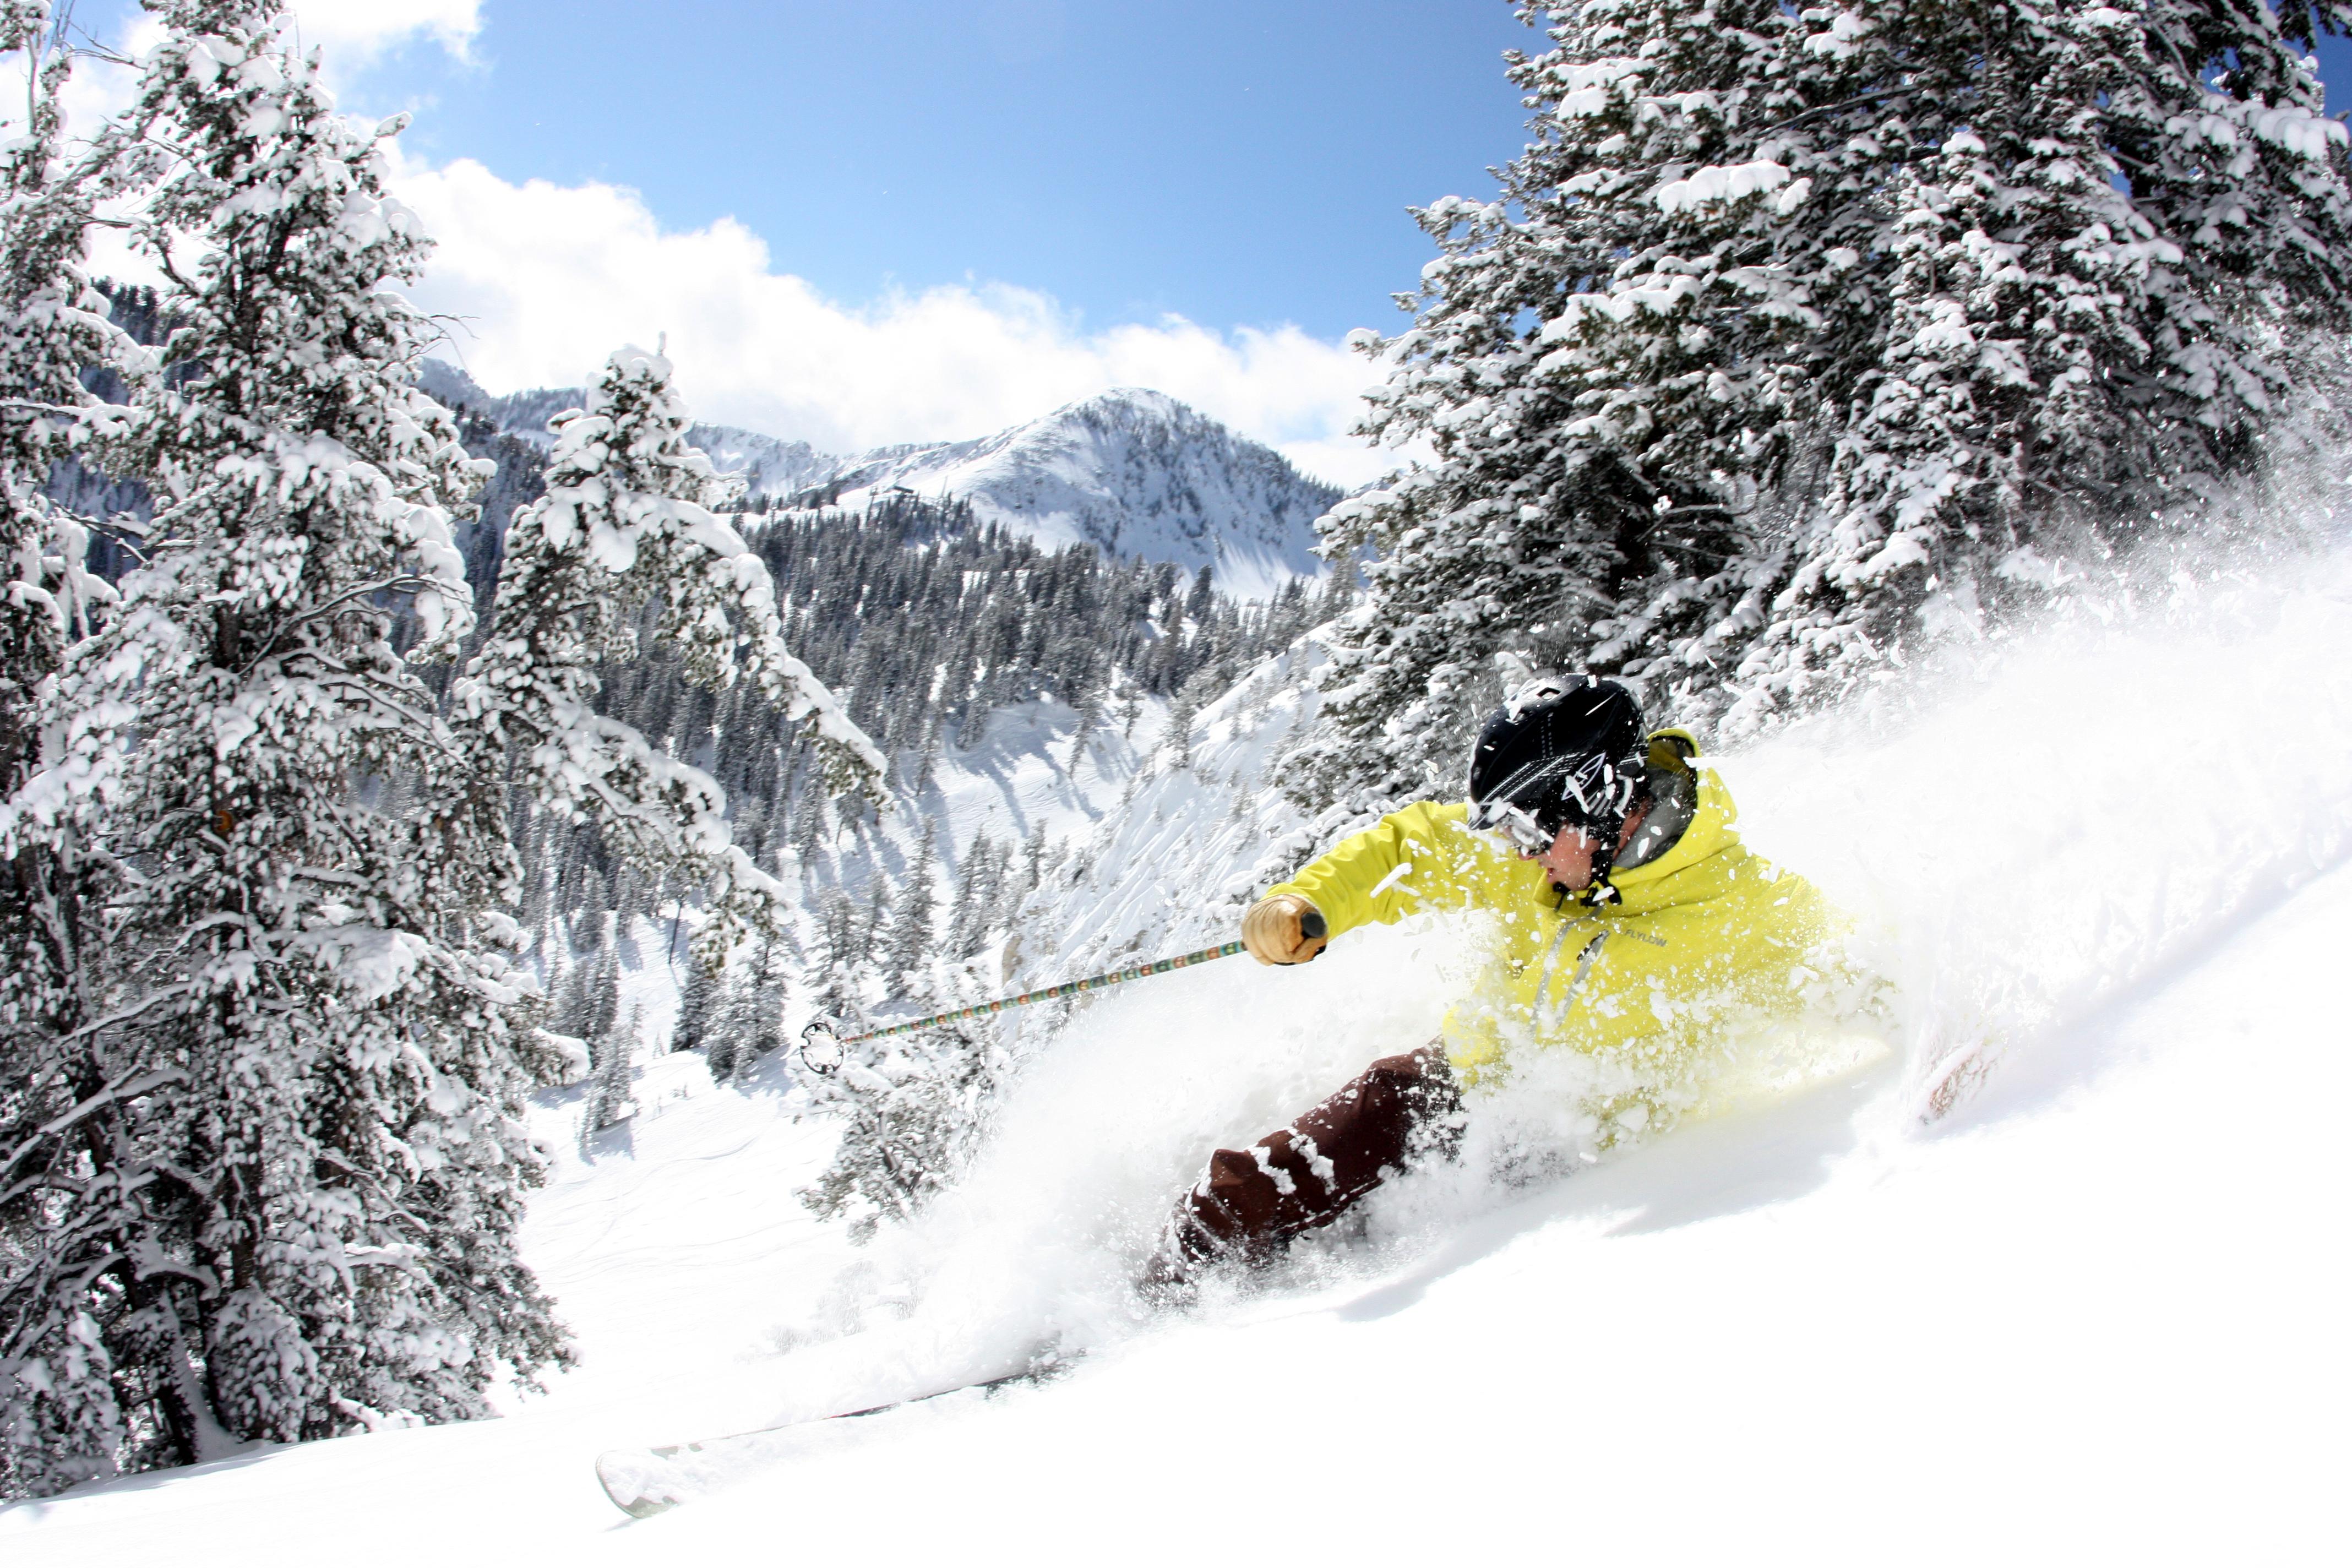 A person skiing down a slope at Solitude ski resort